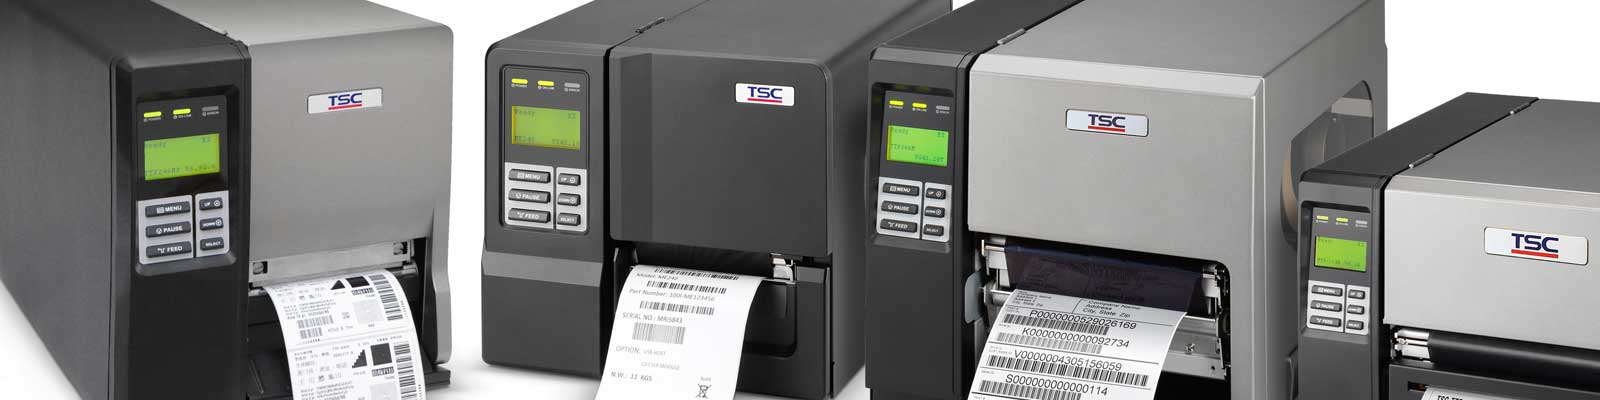 Impresoras Industriales Tsc